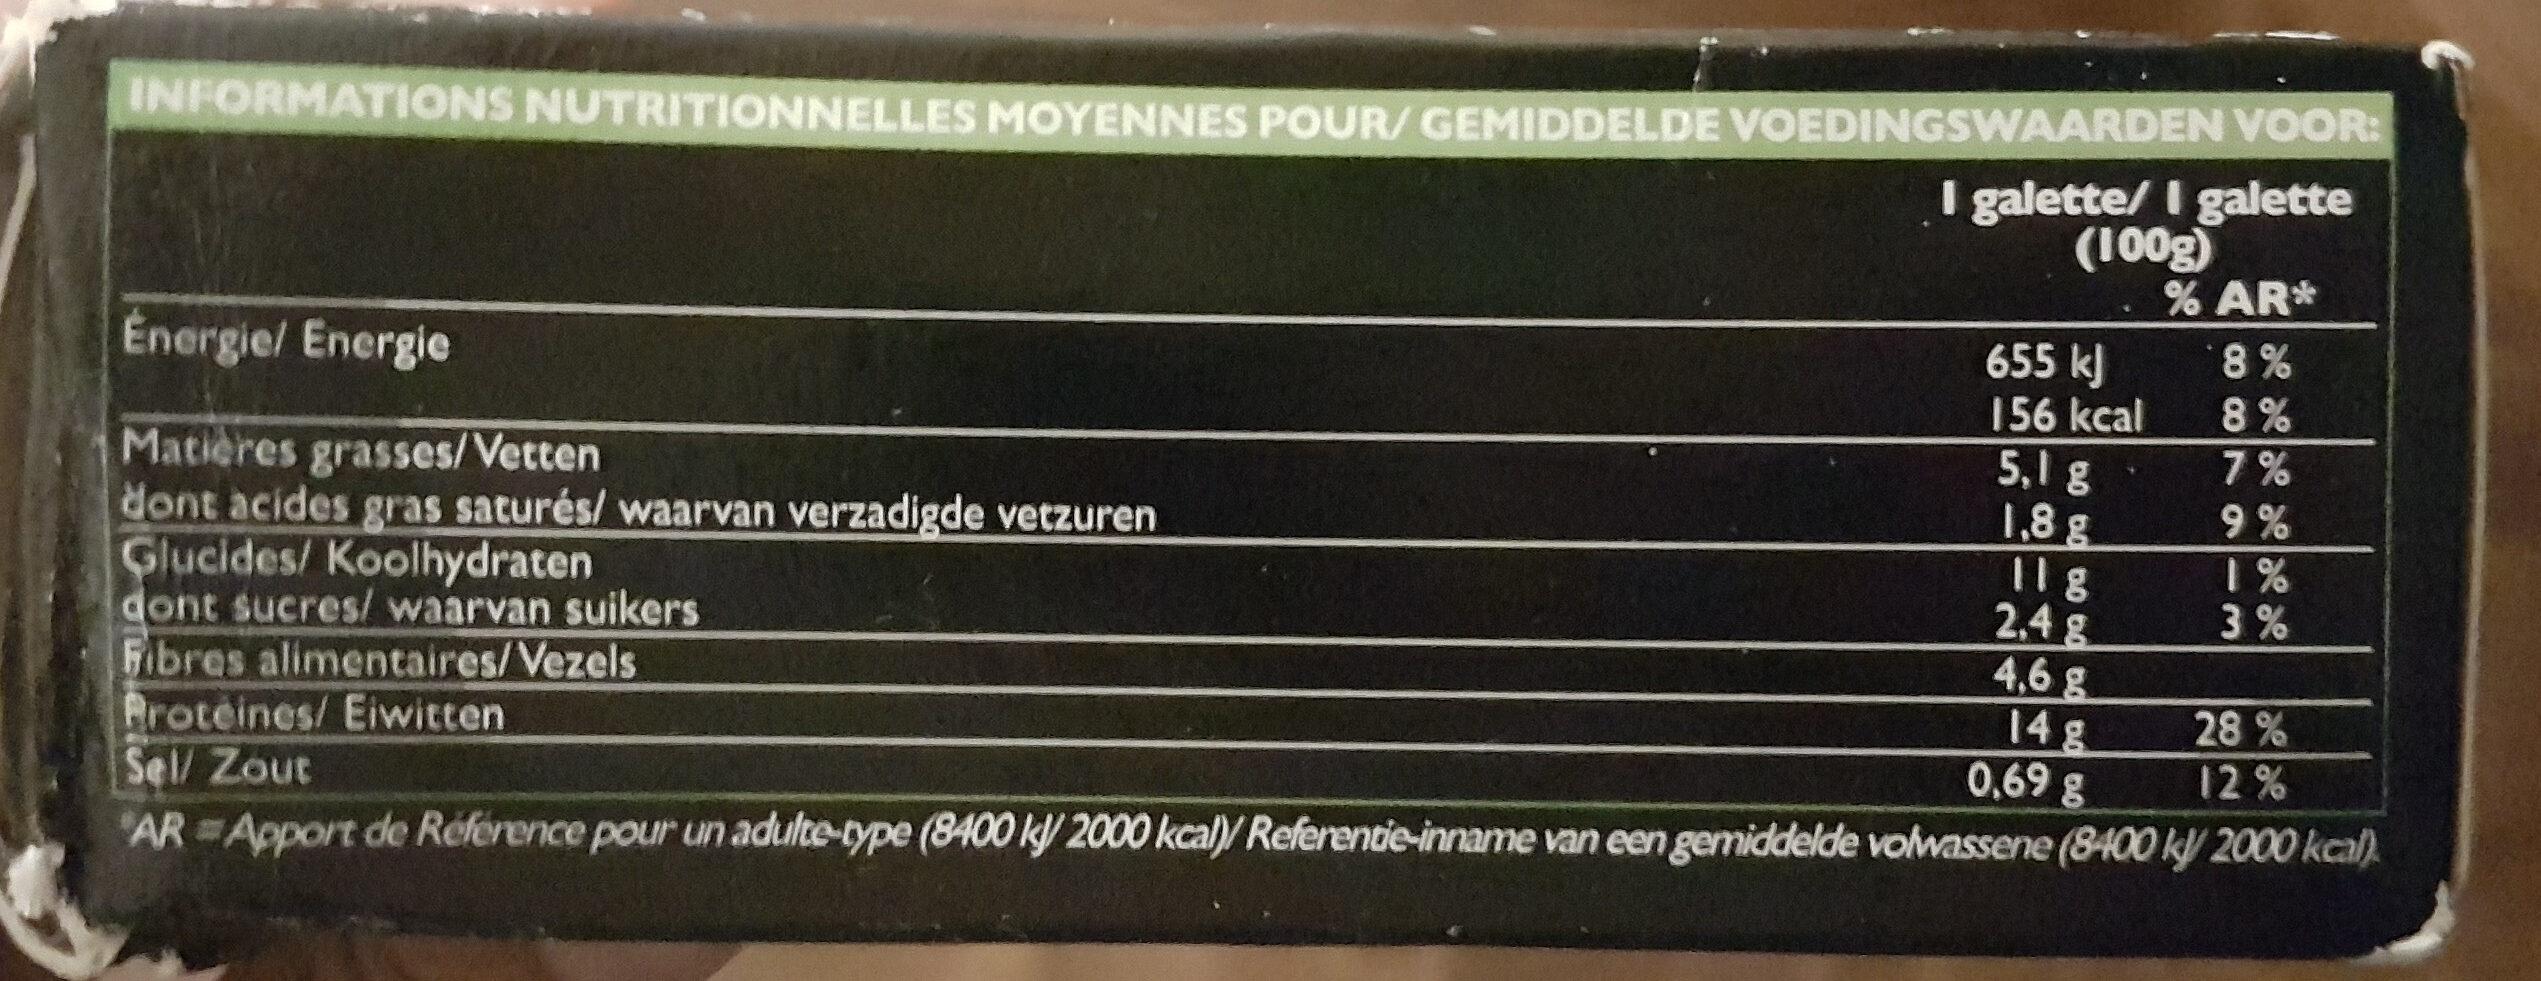 Galettes vegetales provencale - Informations nutritionnelles - fr